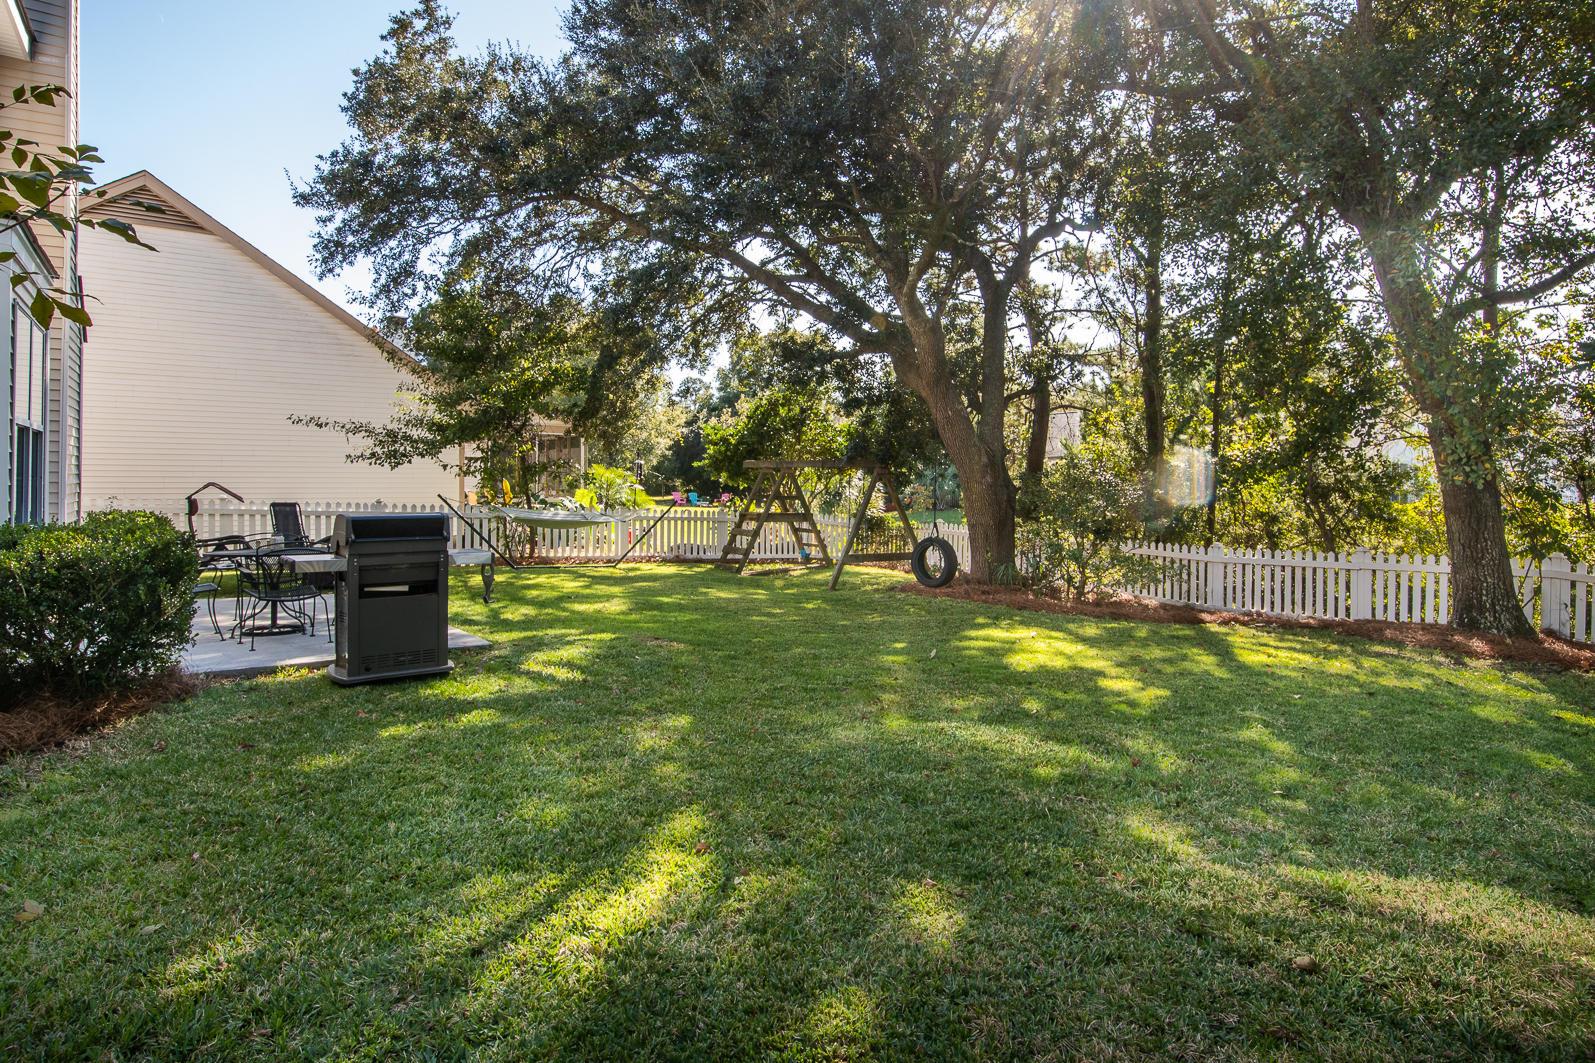 Belle Hall Homes For Sale - 407 Jardinere, Mount Pleasant, SC - 4